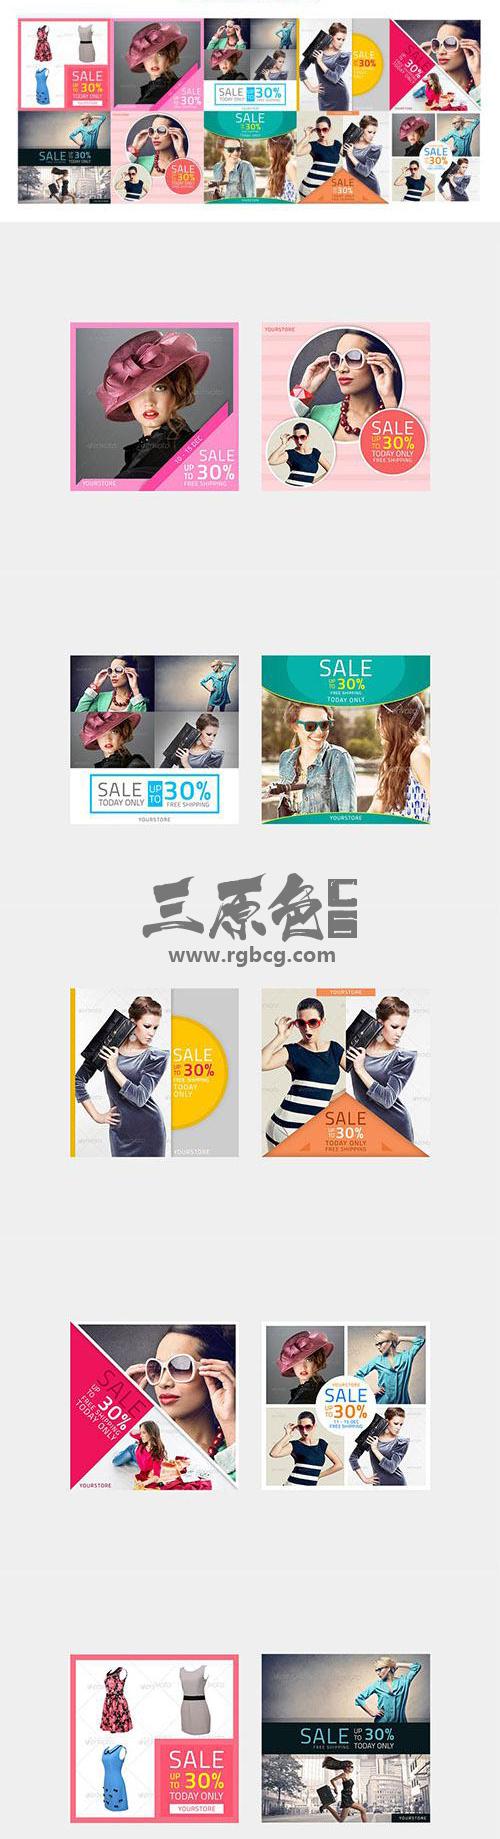 PSD模板 时尚创意方形广告促销展示主图模板 1500X1500 PSD 模板-第1张